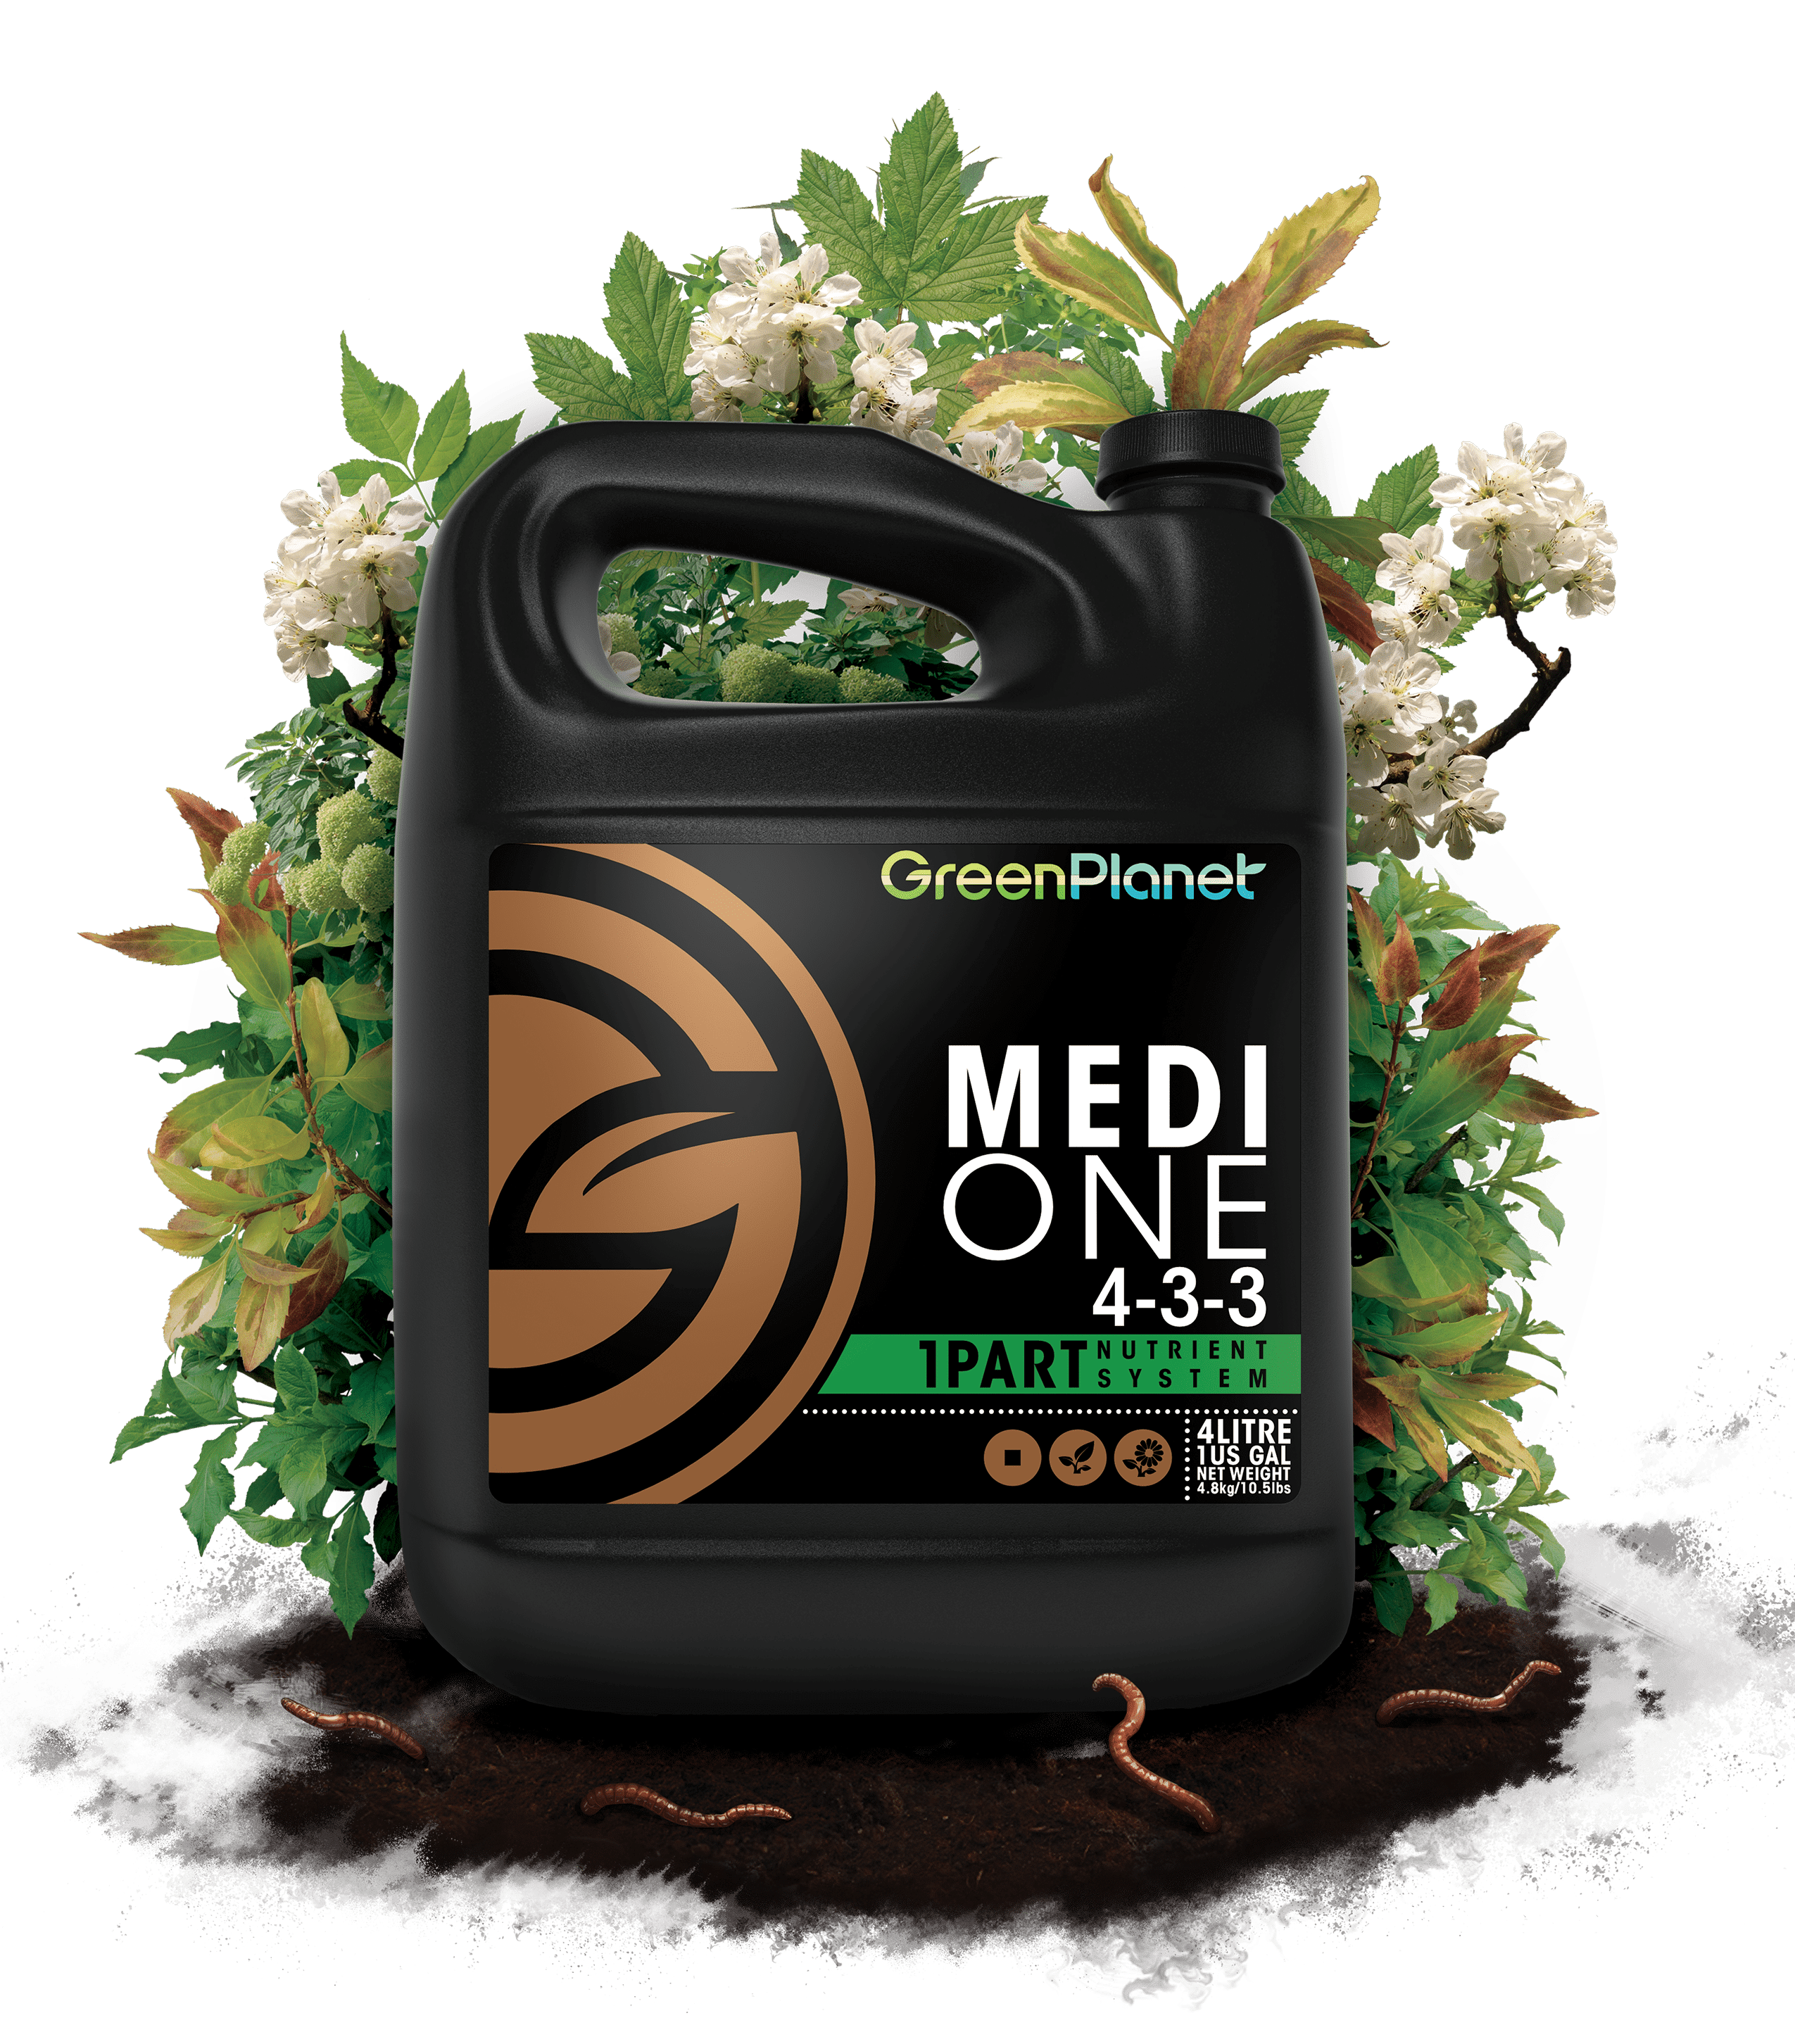 Medi One Medicinal